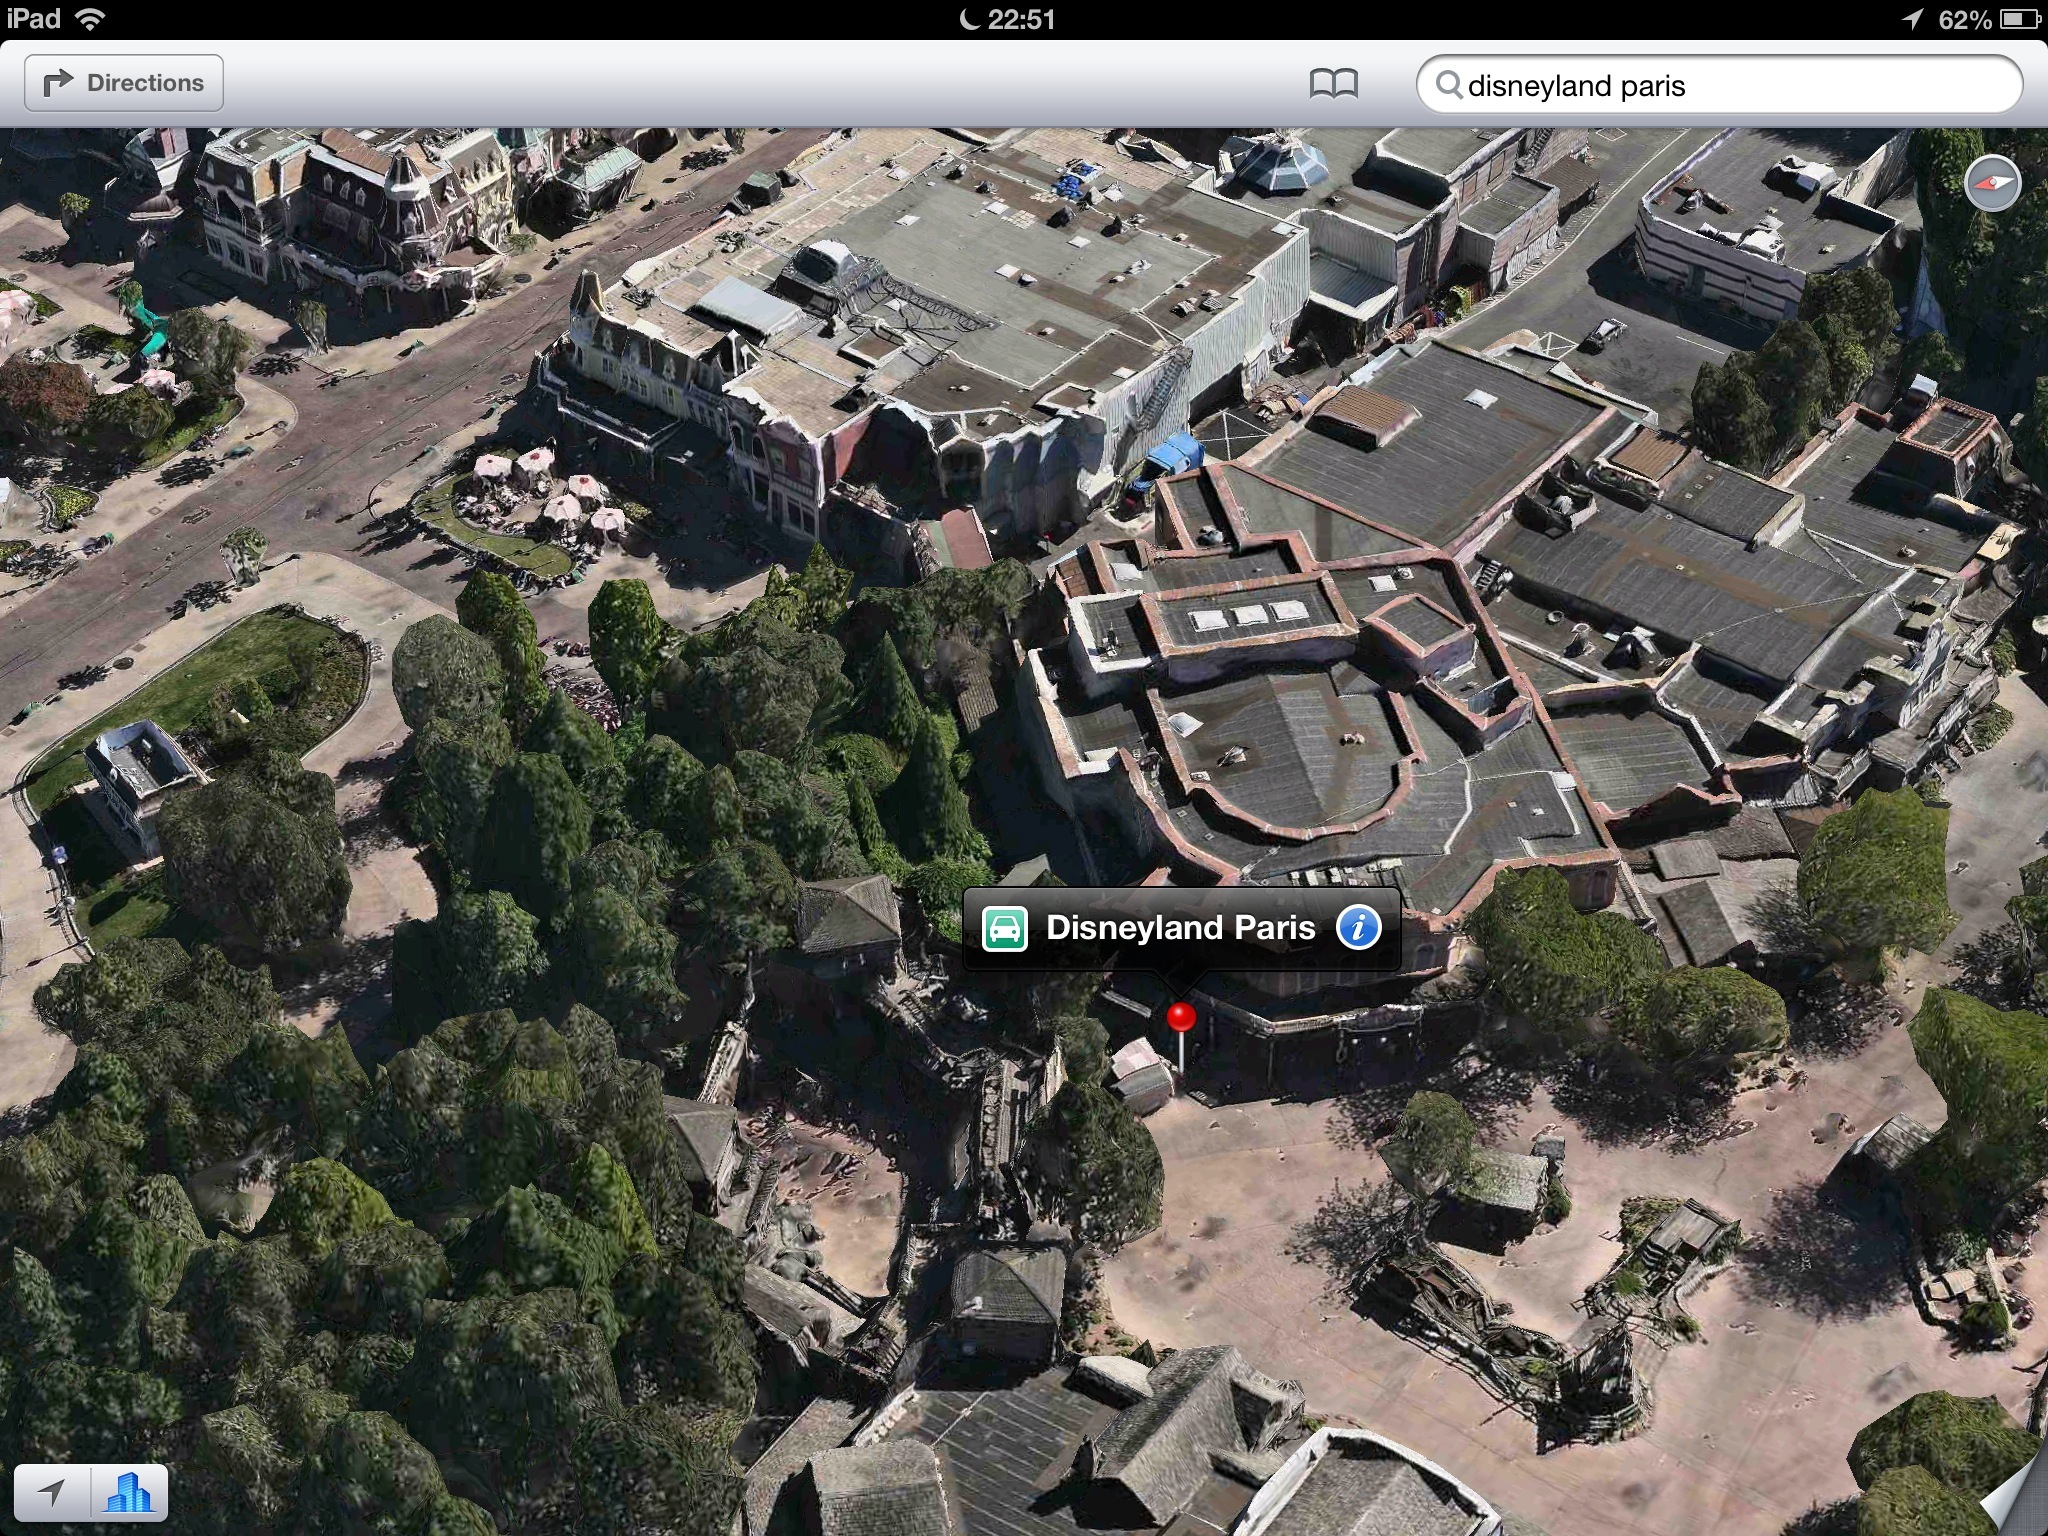 Apple Maps (Flyover, Disneyalnd, Paris)